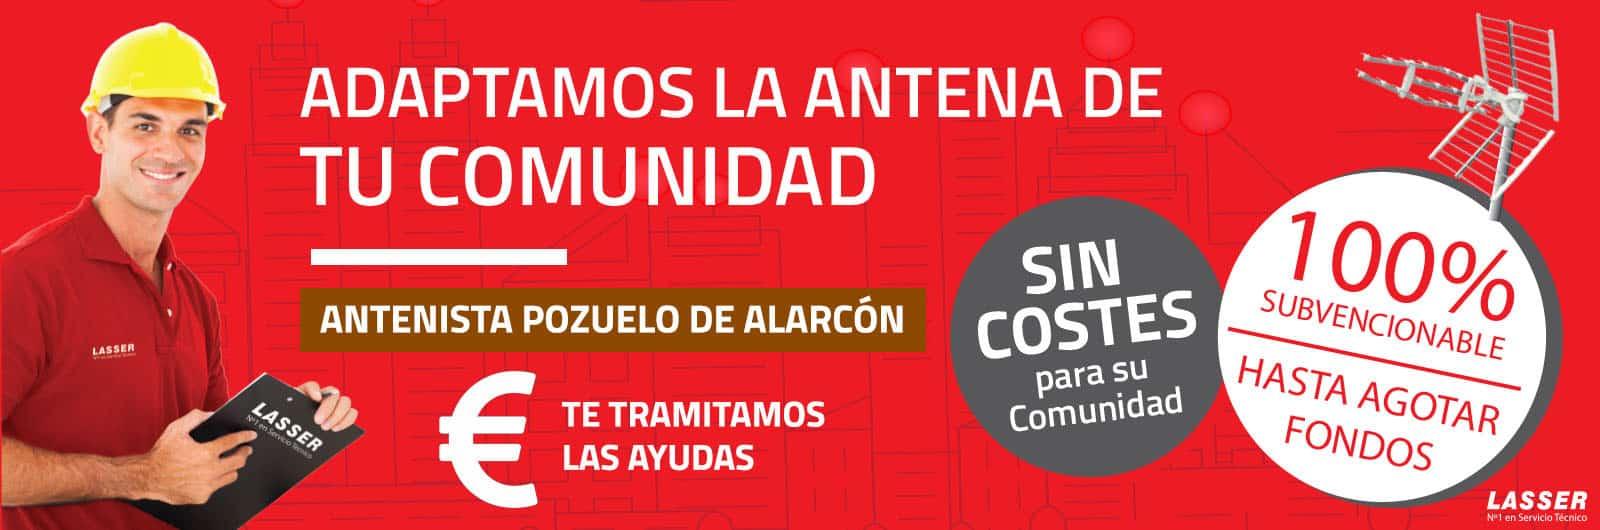 segundo-dividendo-digital-antena-comunidades-promocion-pozuelo-alarcon